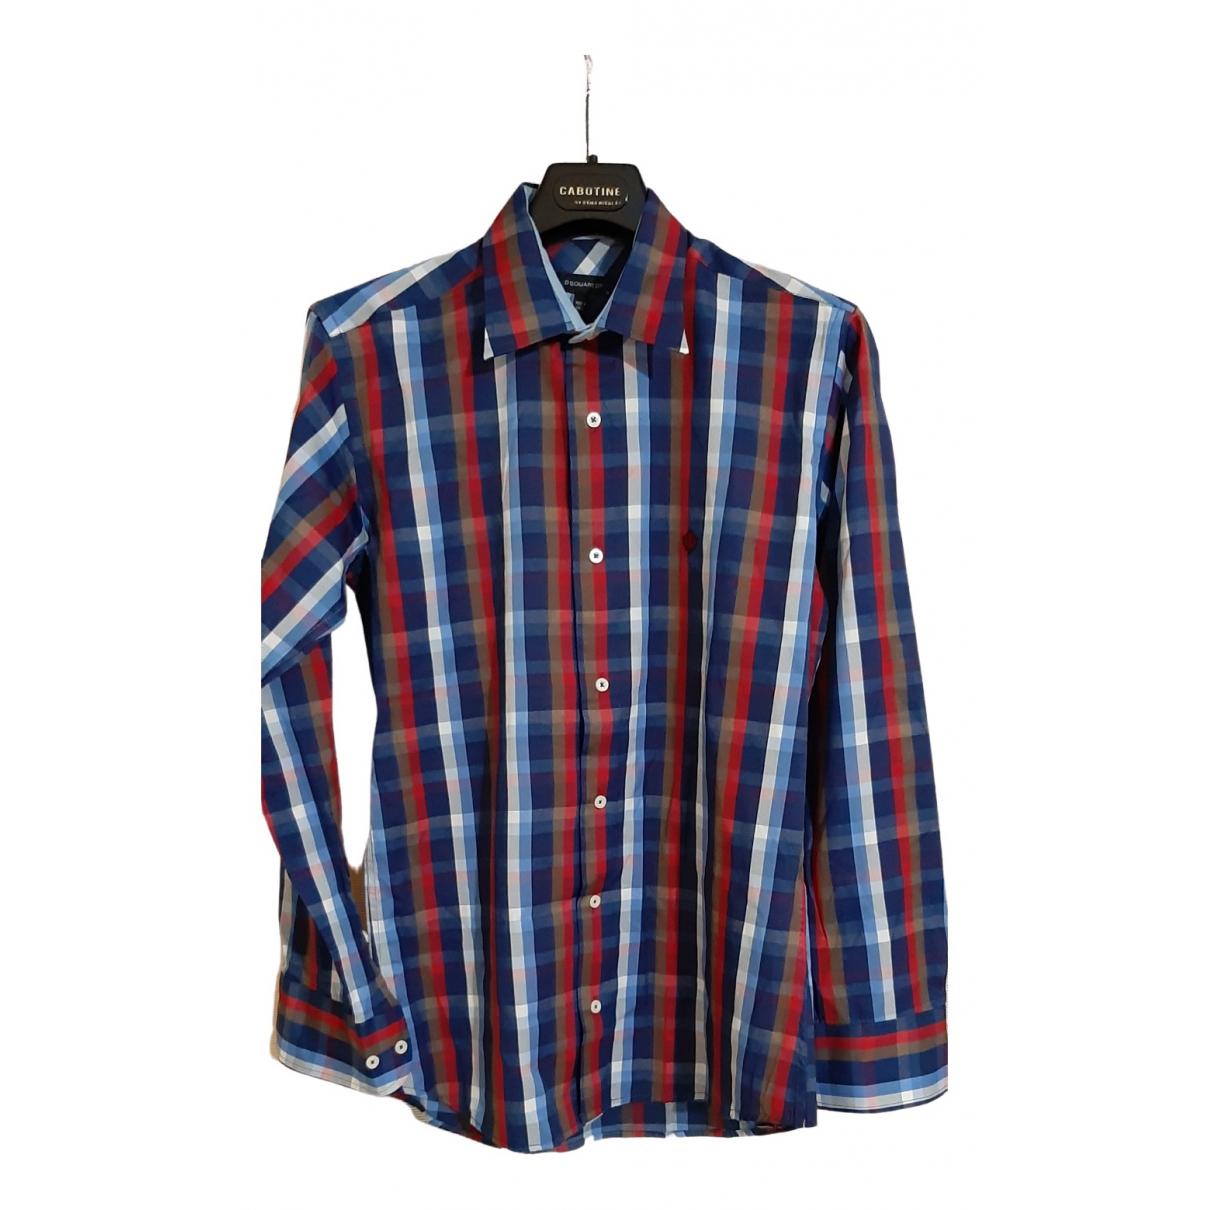 Dsquared2 \N Multicolour Cotton Shirts for Men S International